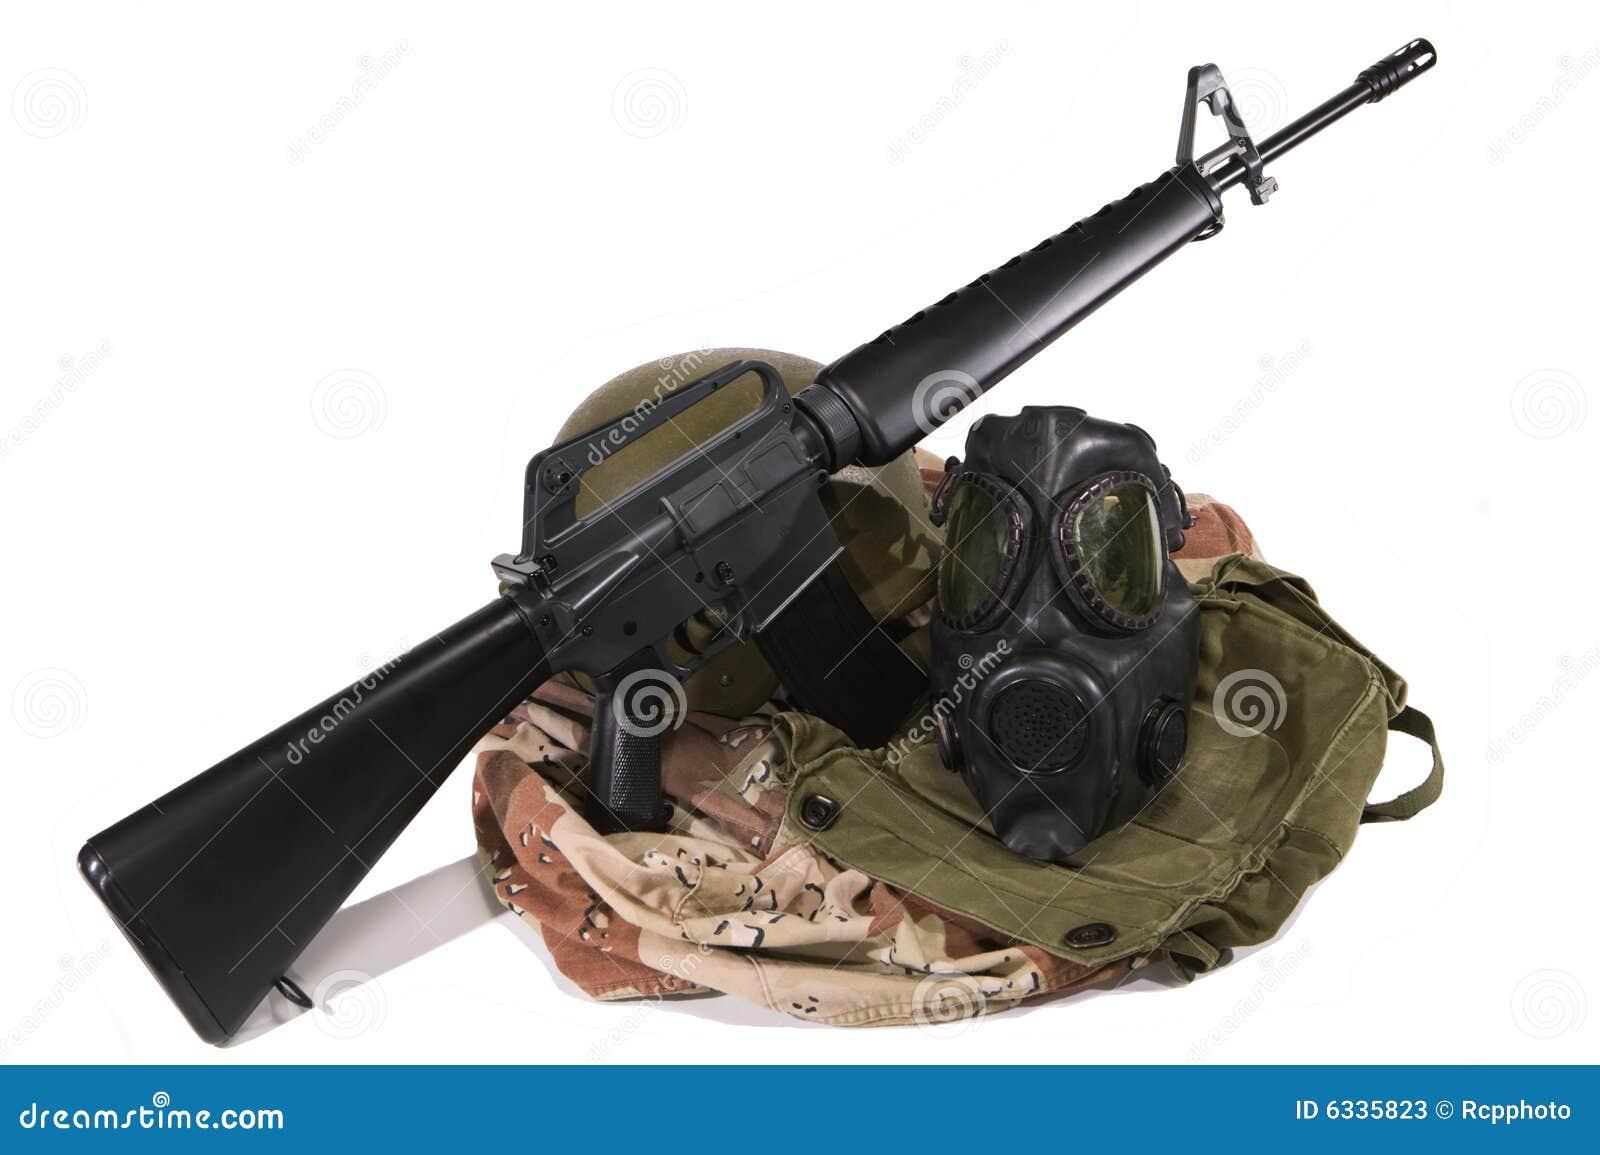 Gulf War US Army Uniform And M16 Rifle Stock Photos ... M16